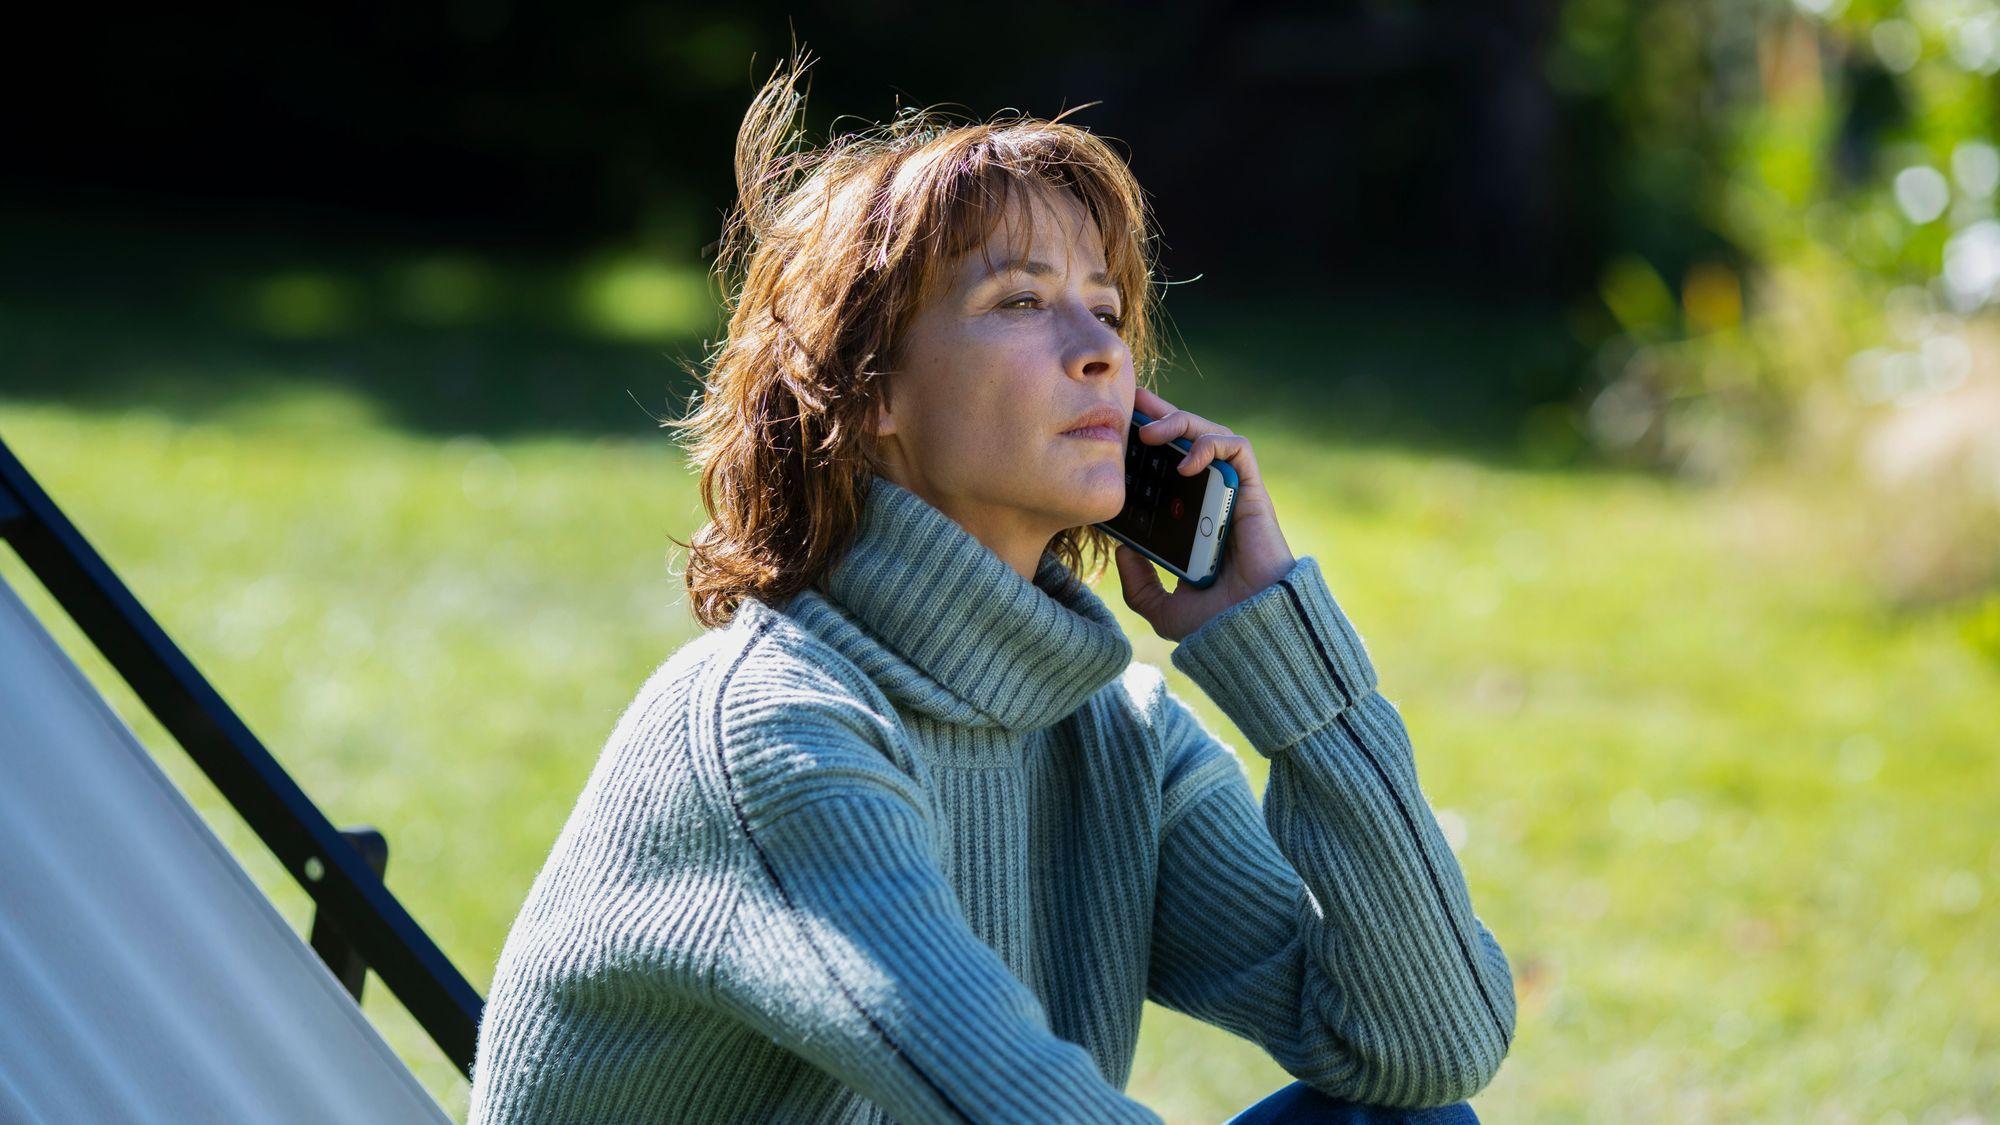 Everything Went Fine recensione film di François Ozon con Sophie Marceau